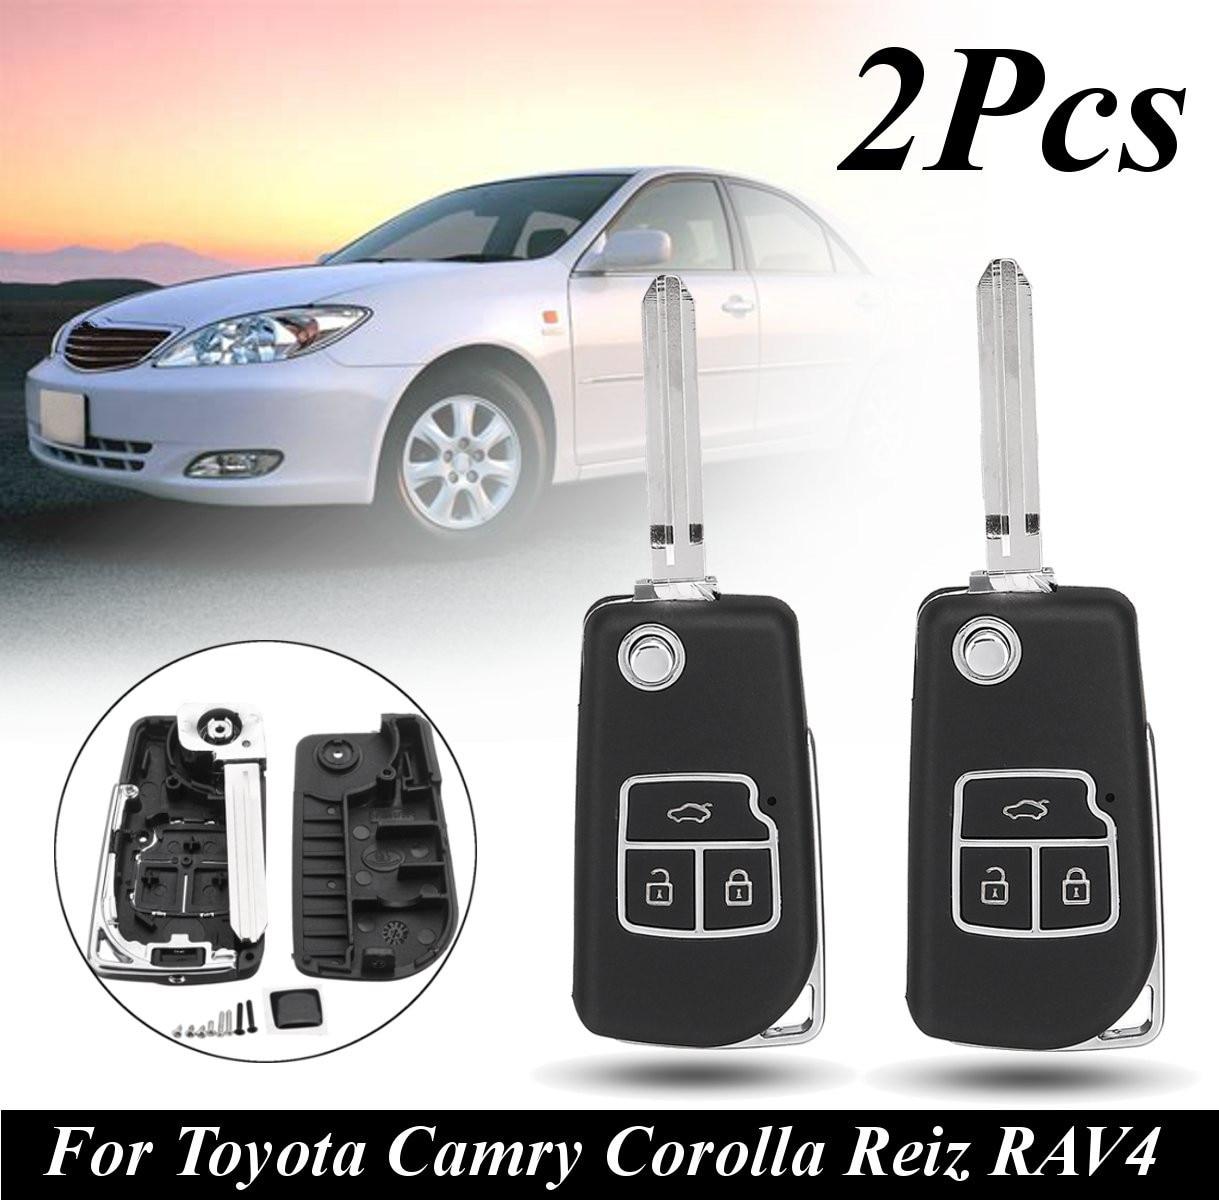 2 шт. 3 кнопки дистанционного ключа автомобиля чехол ж/лезвия для Toyota Camry Corolla Reiz RAV4